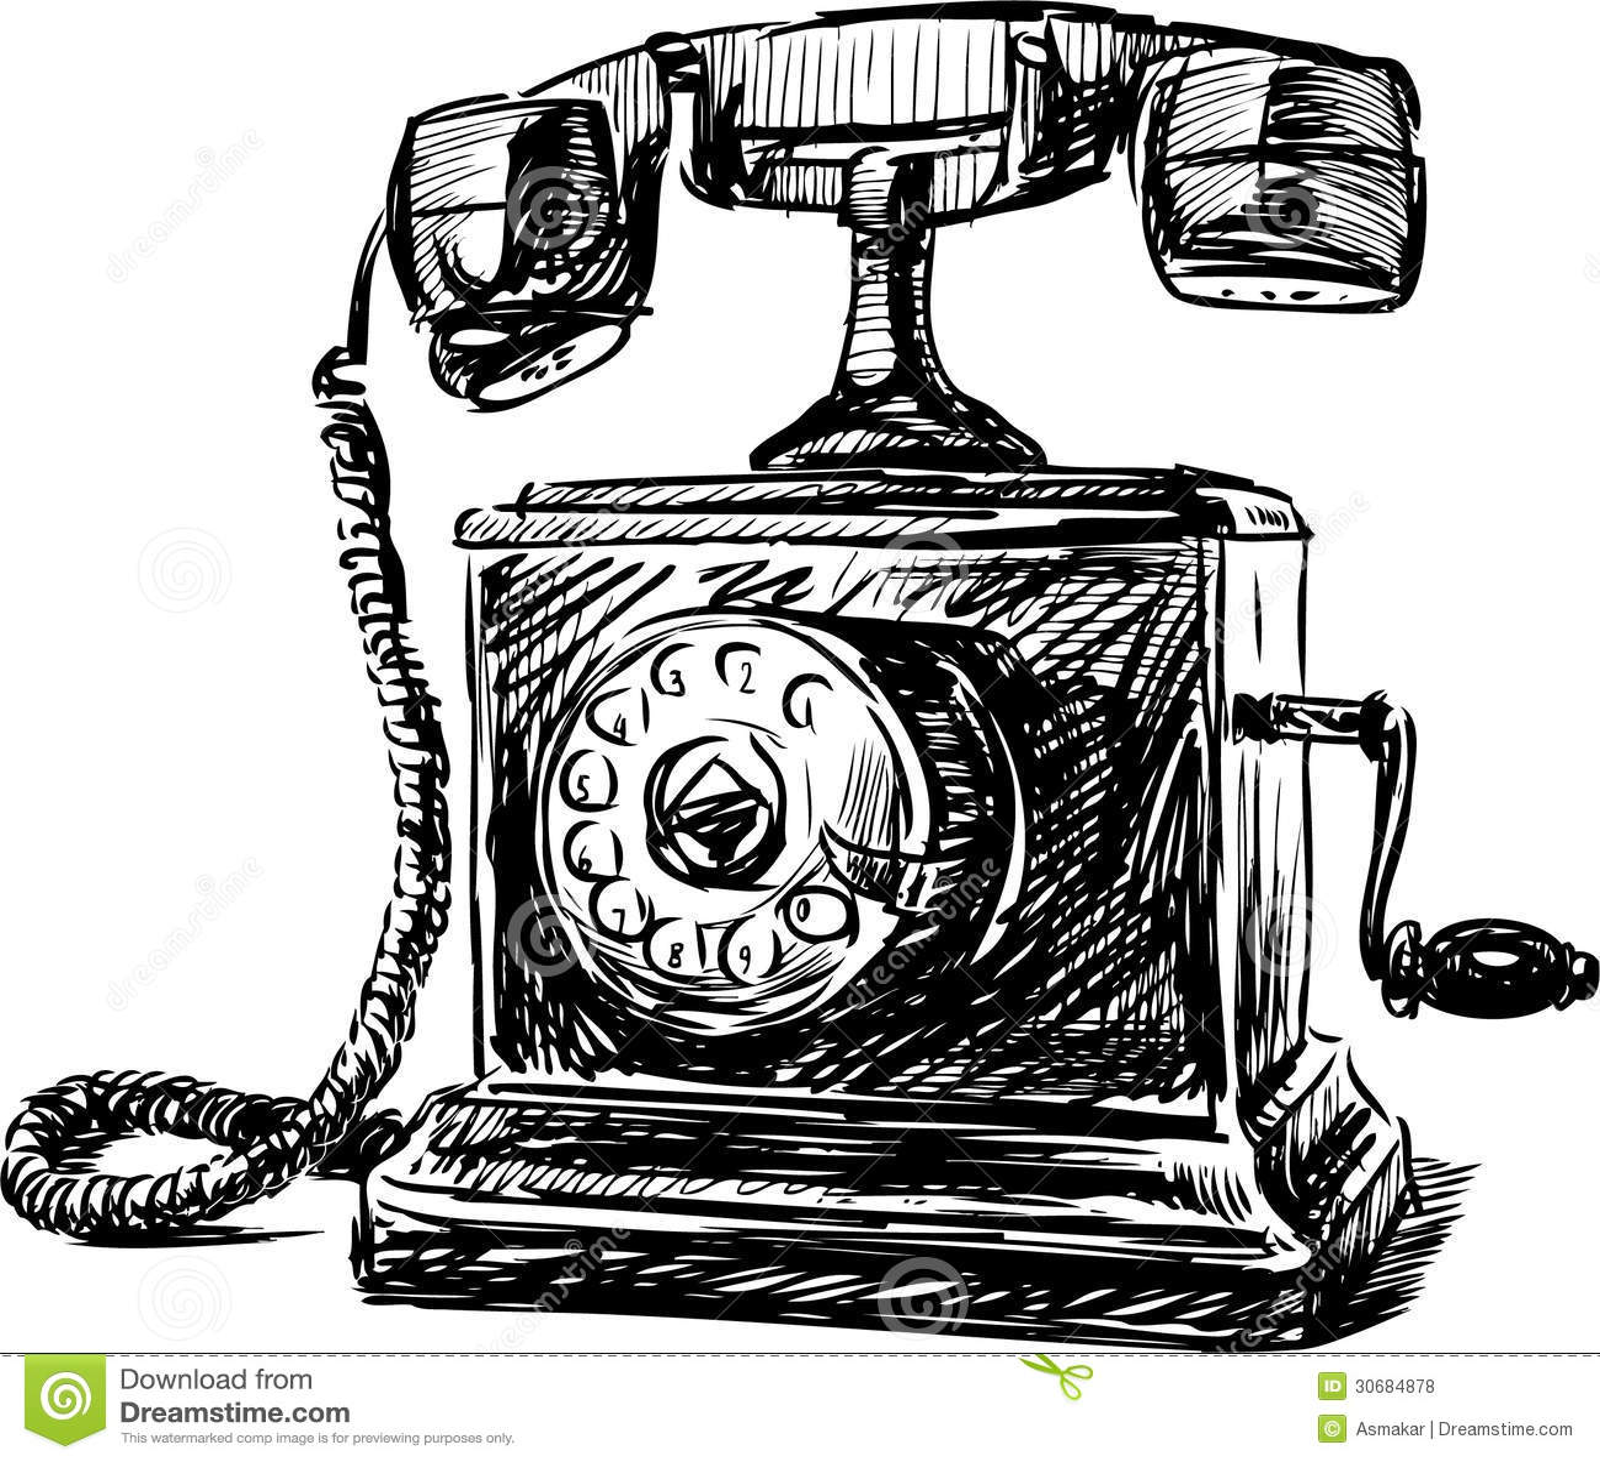 clip art antique phone - photo #50